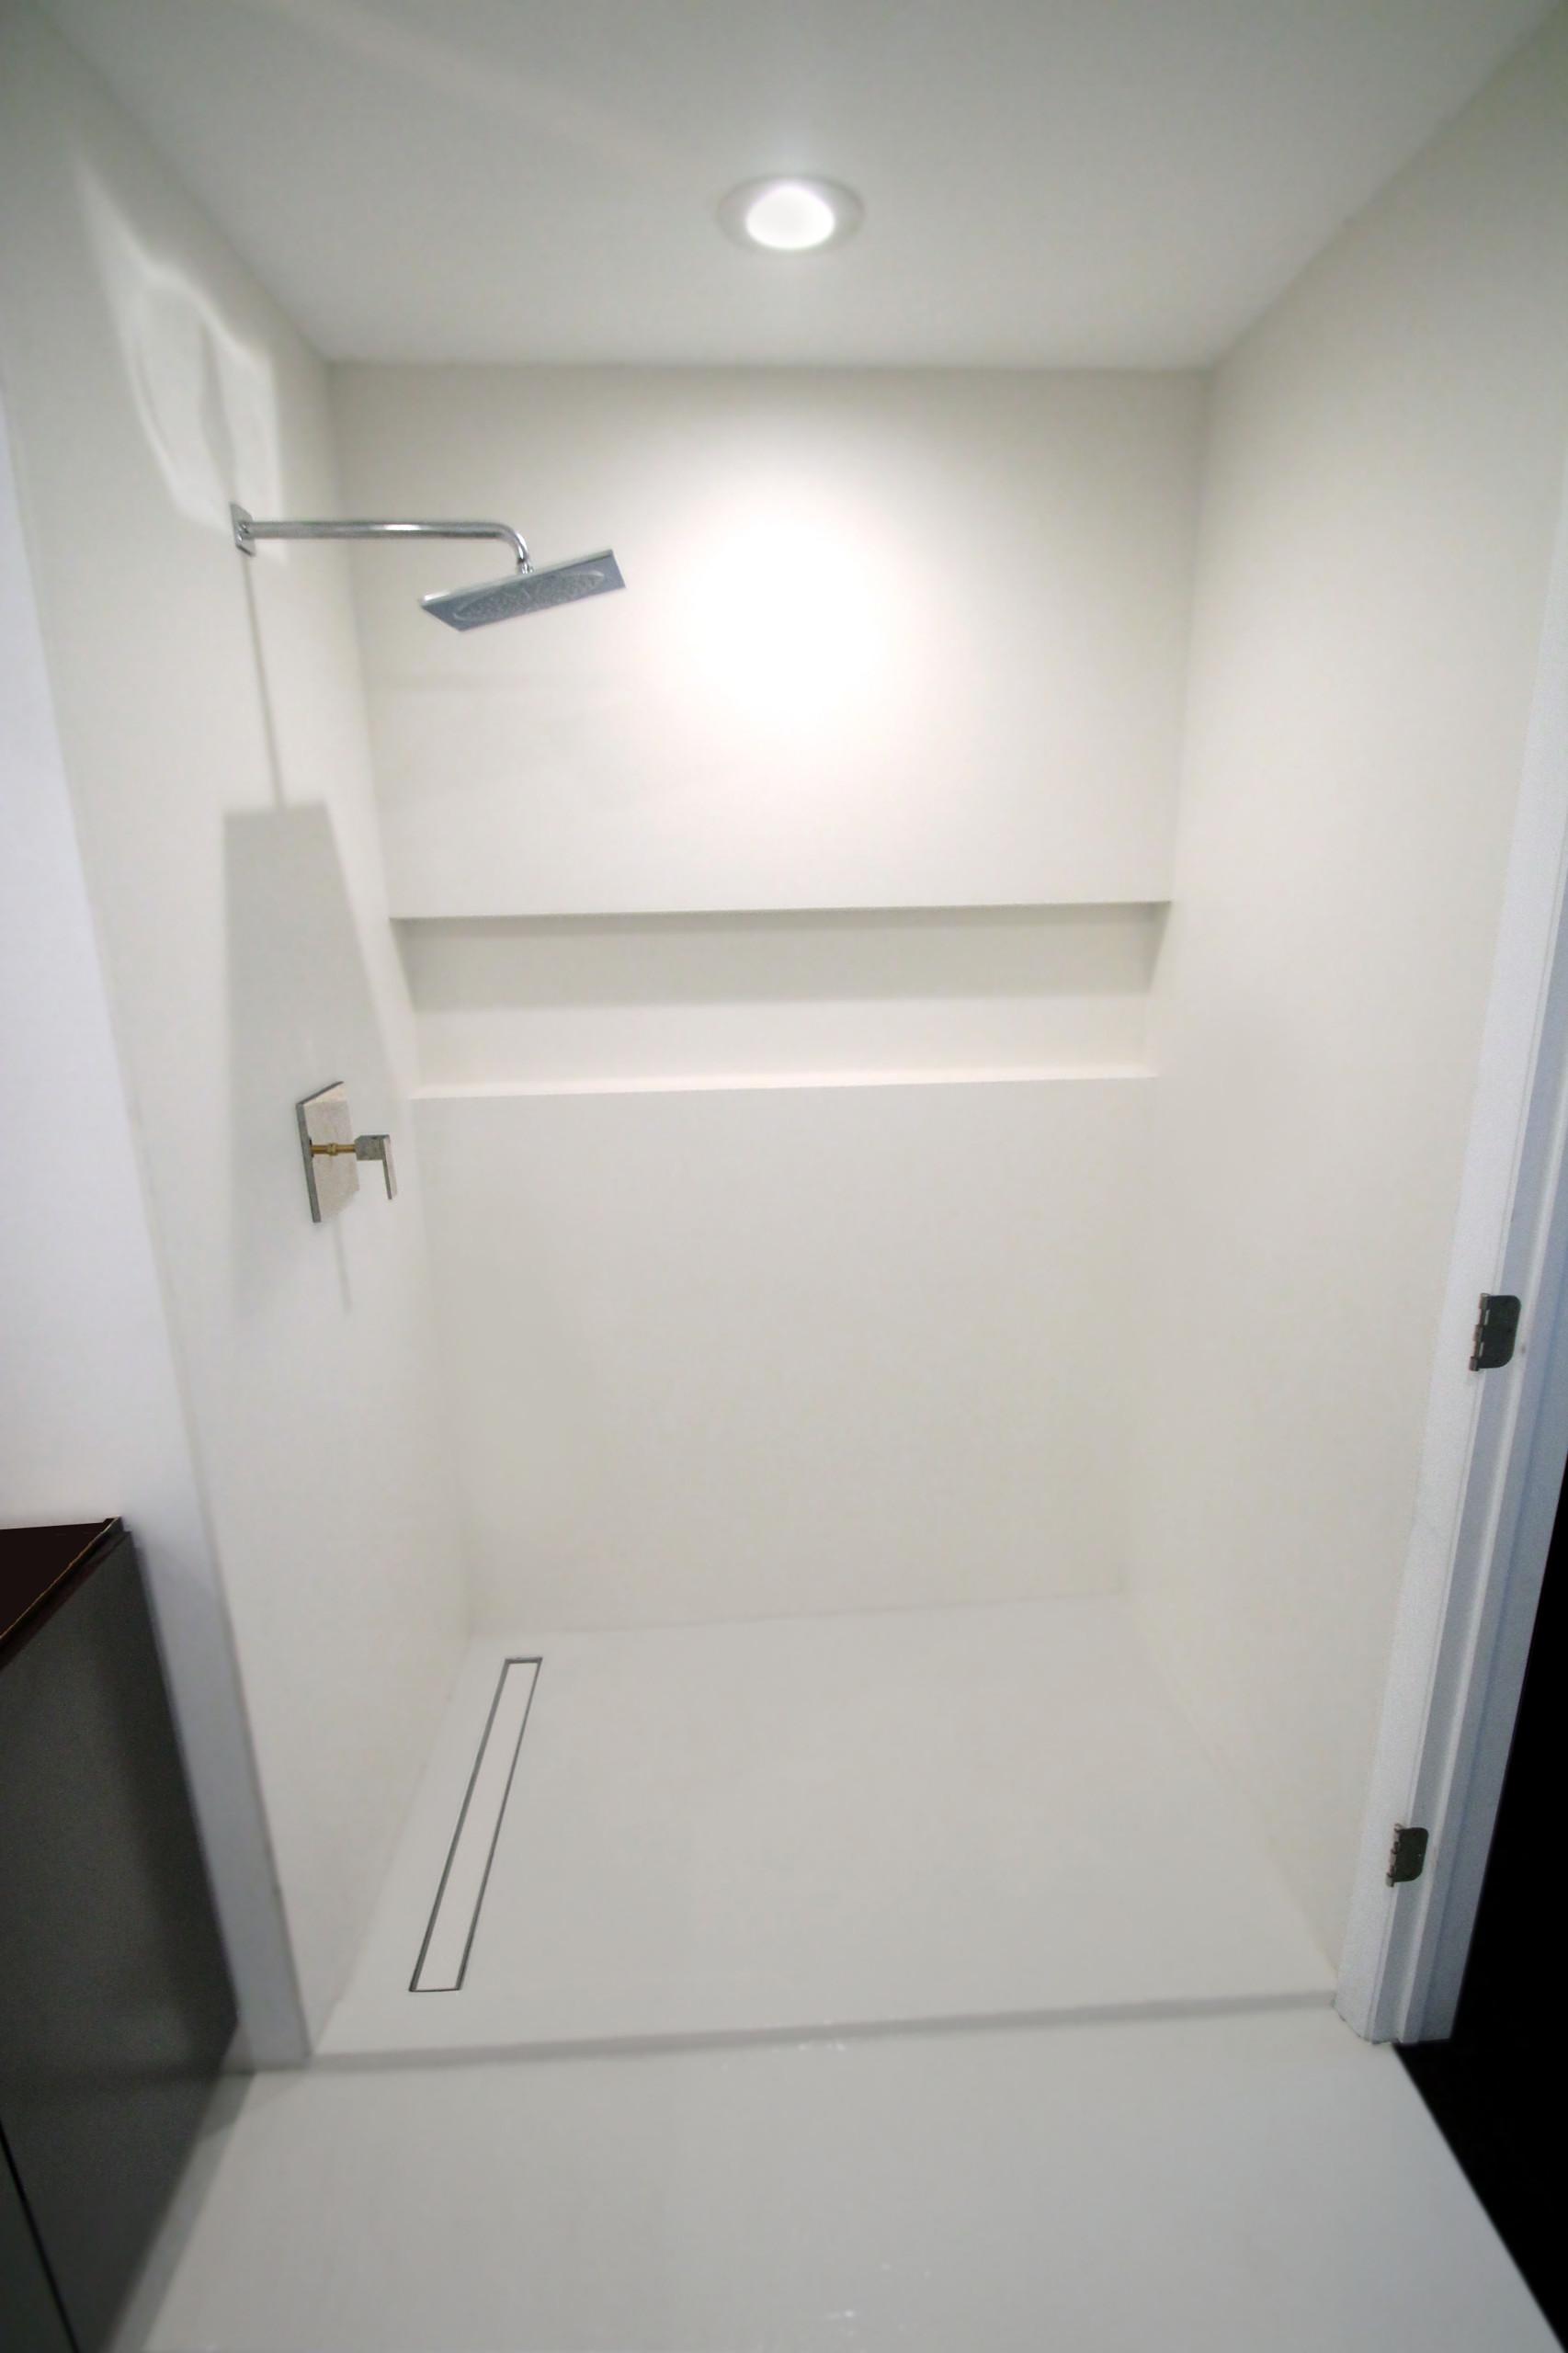 Minimalist White Bathroom - Neolith XL Porcelain tile slab/panel shower w niche